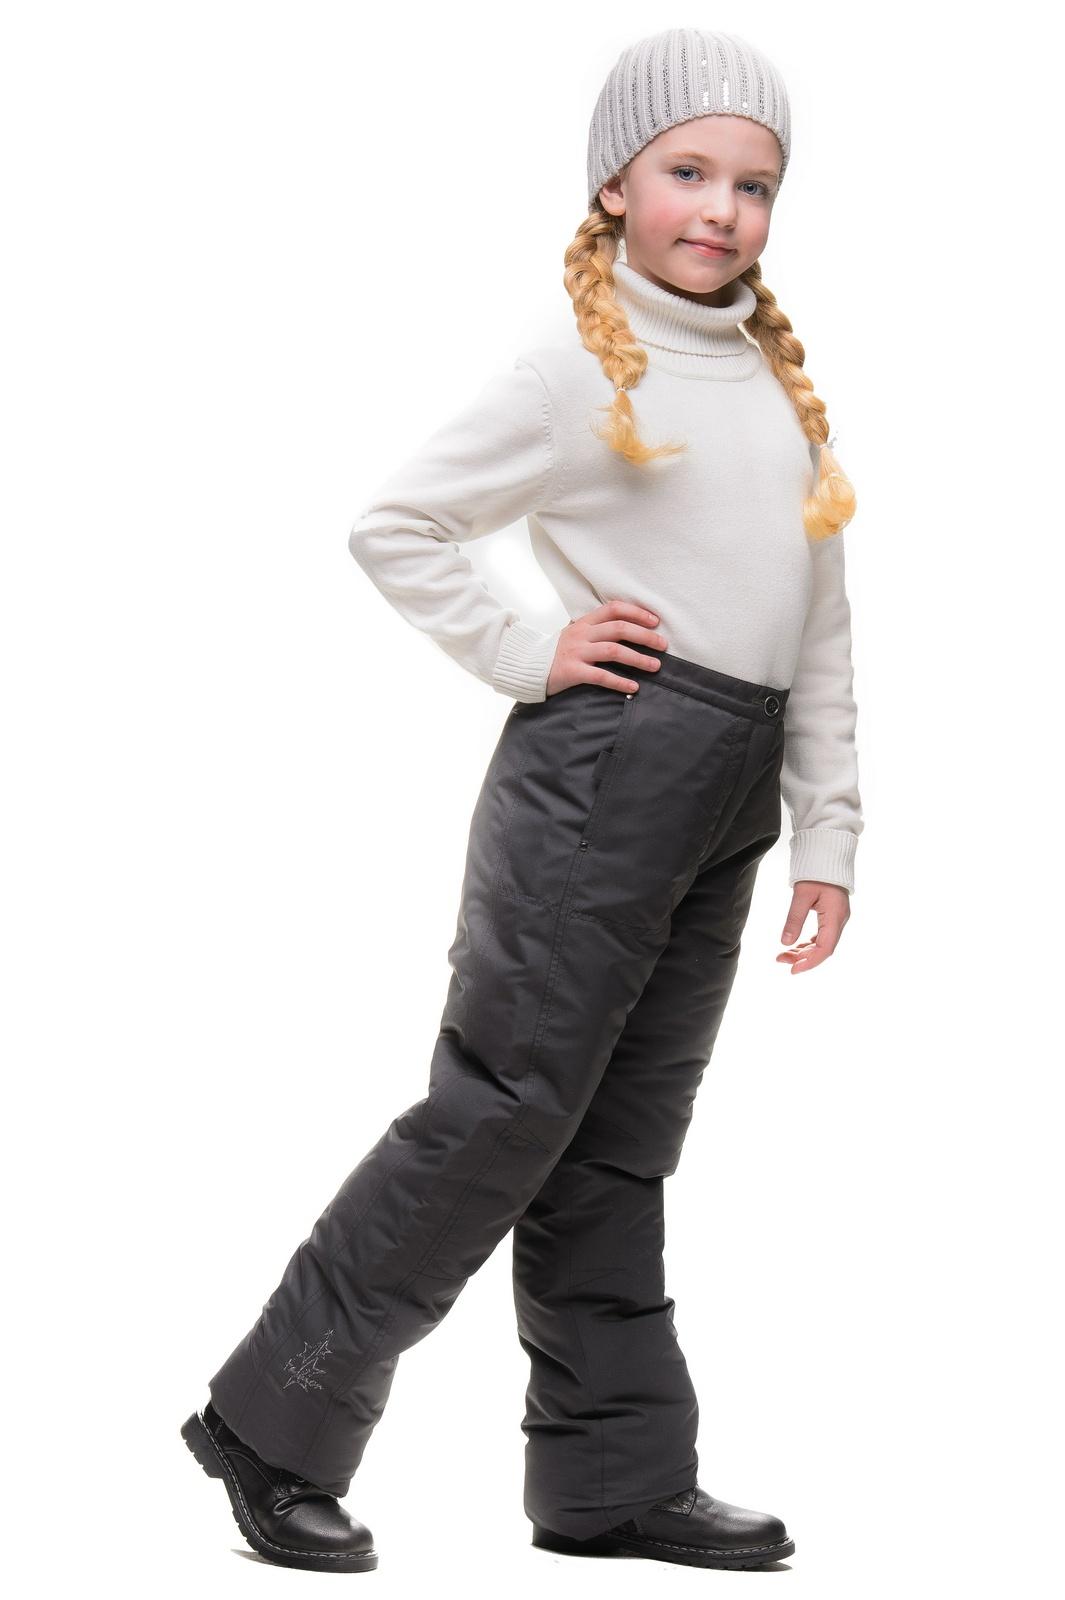 Брюки SAIMA брюки для девочки oldos милена цвет темно серый 3б1374 размер 152 12 лет